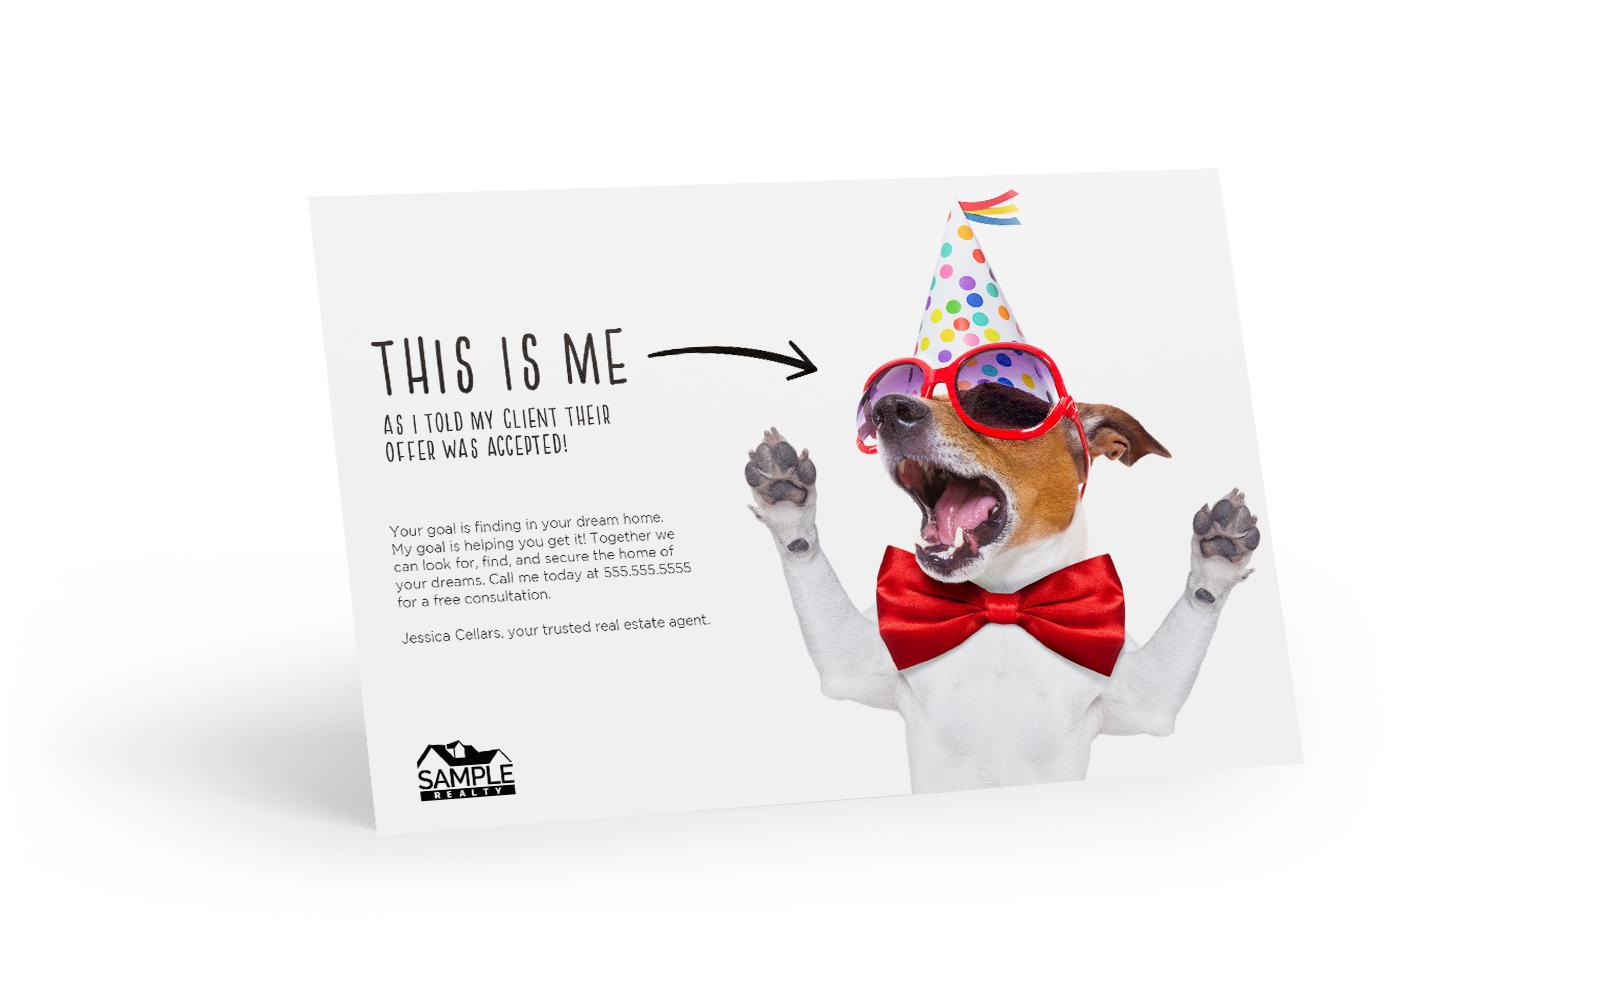 Corefact The Light Side - The Celebrating Beagle